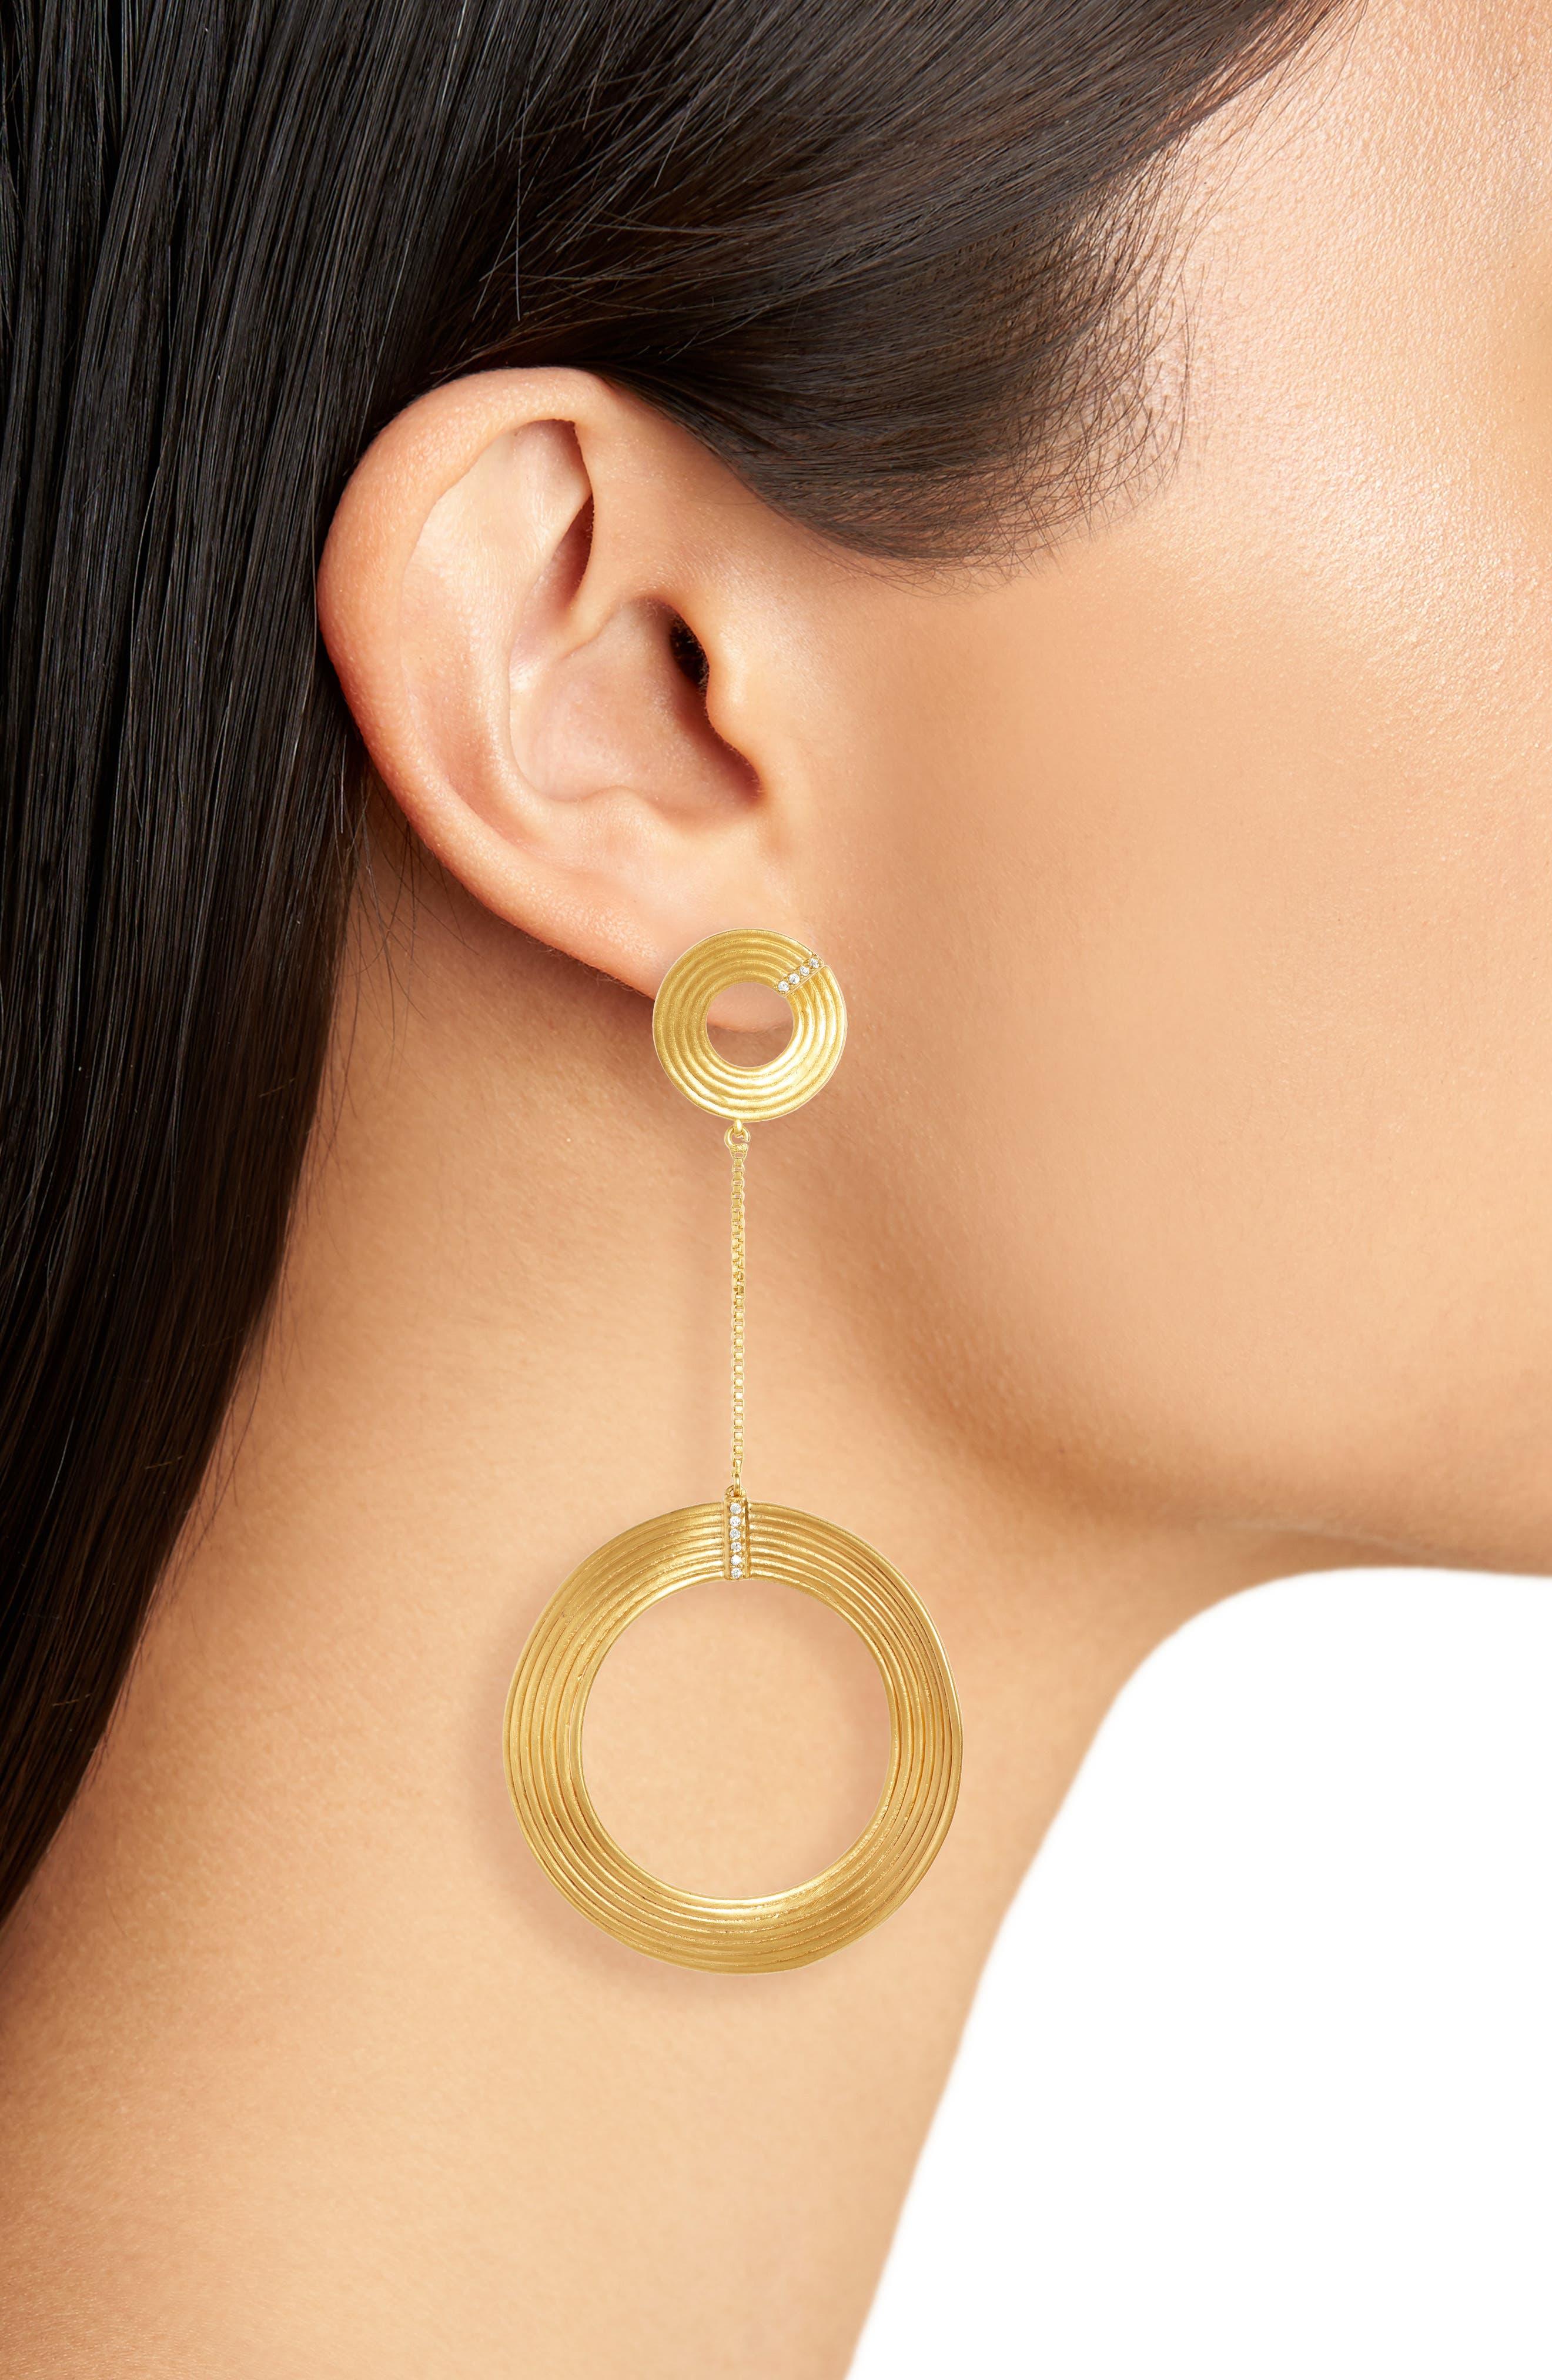 Zaha Drop Earrings,                             Alternate thumbnail 2, color,                             710